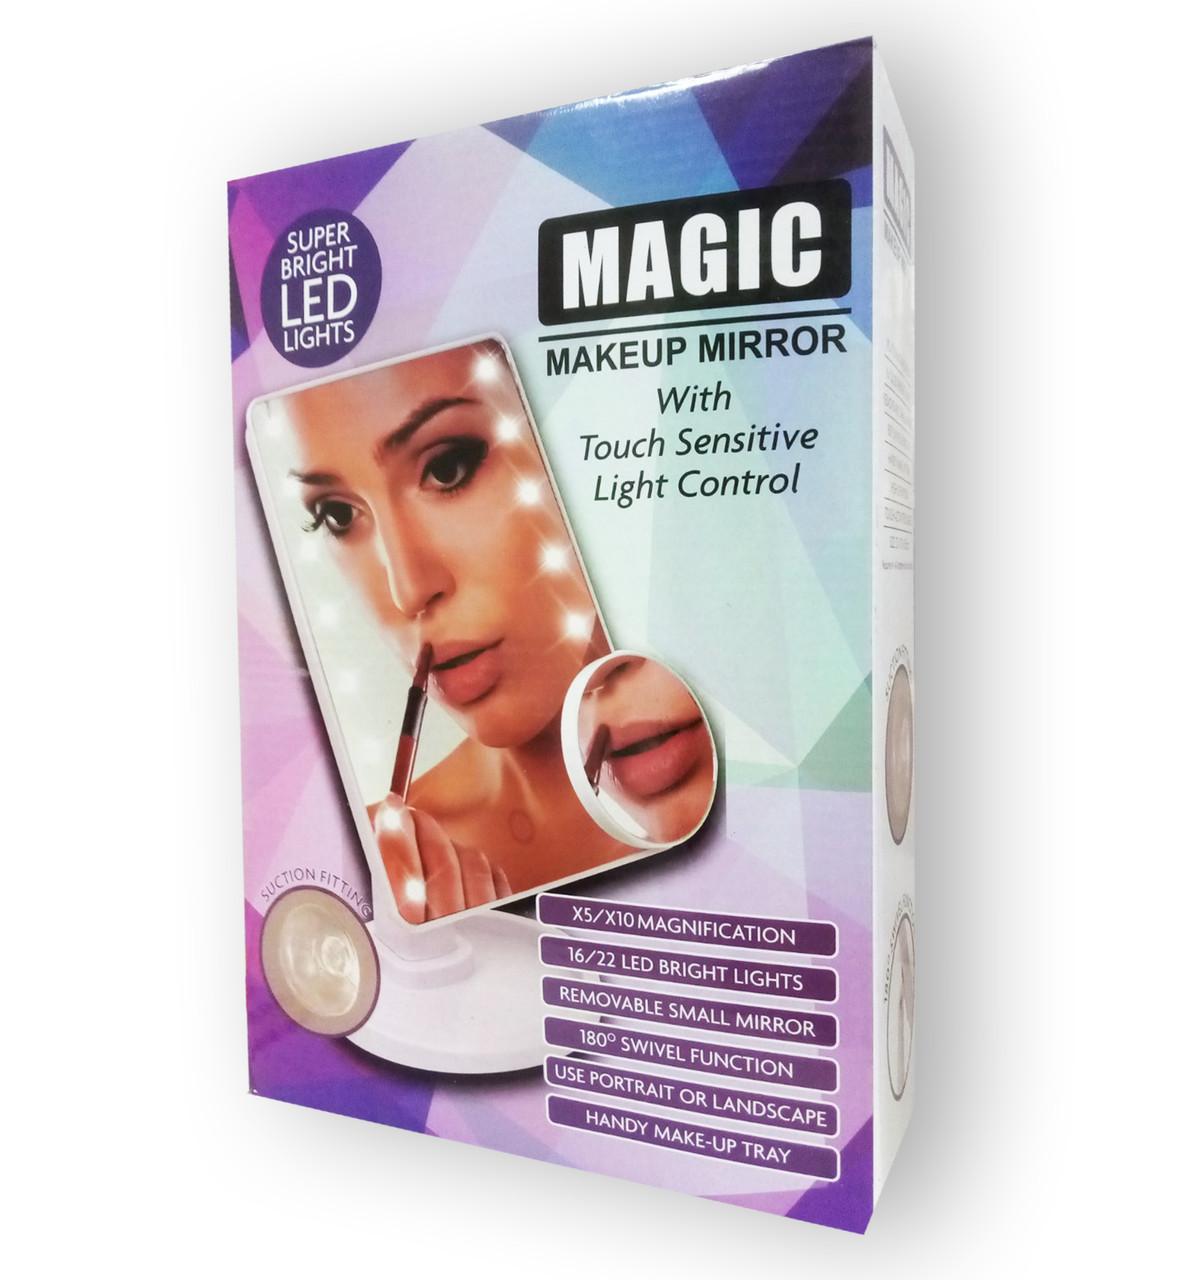 Magic Makeup Mirror - Зеркало для макияжа с LED-подсветкой (Меджик Мэйкап Миррор)